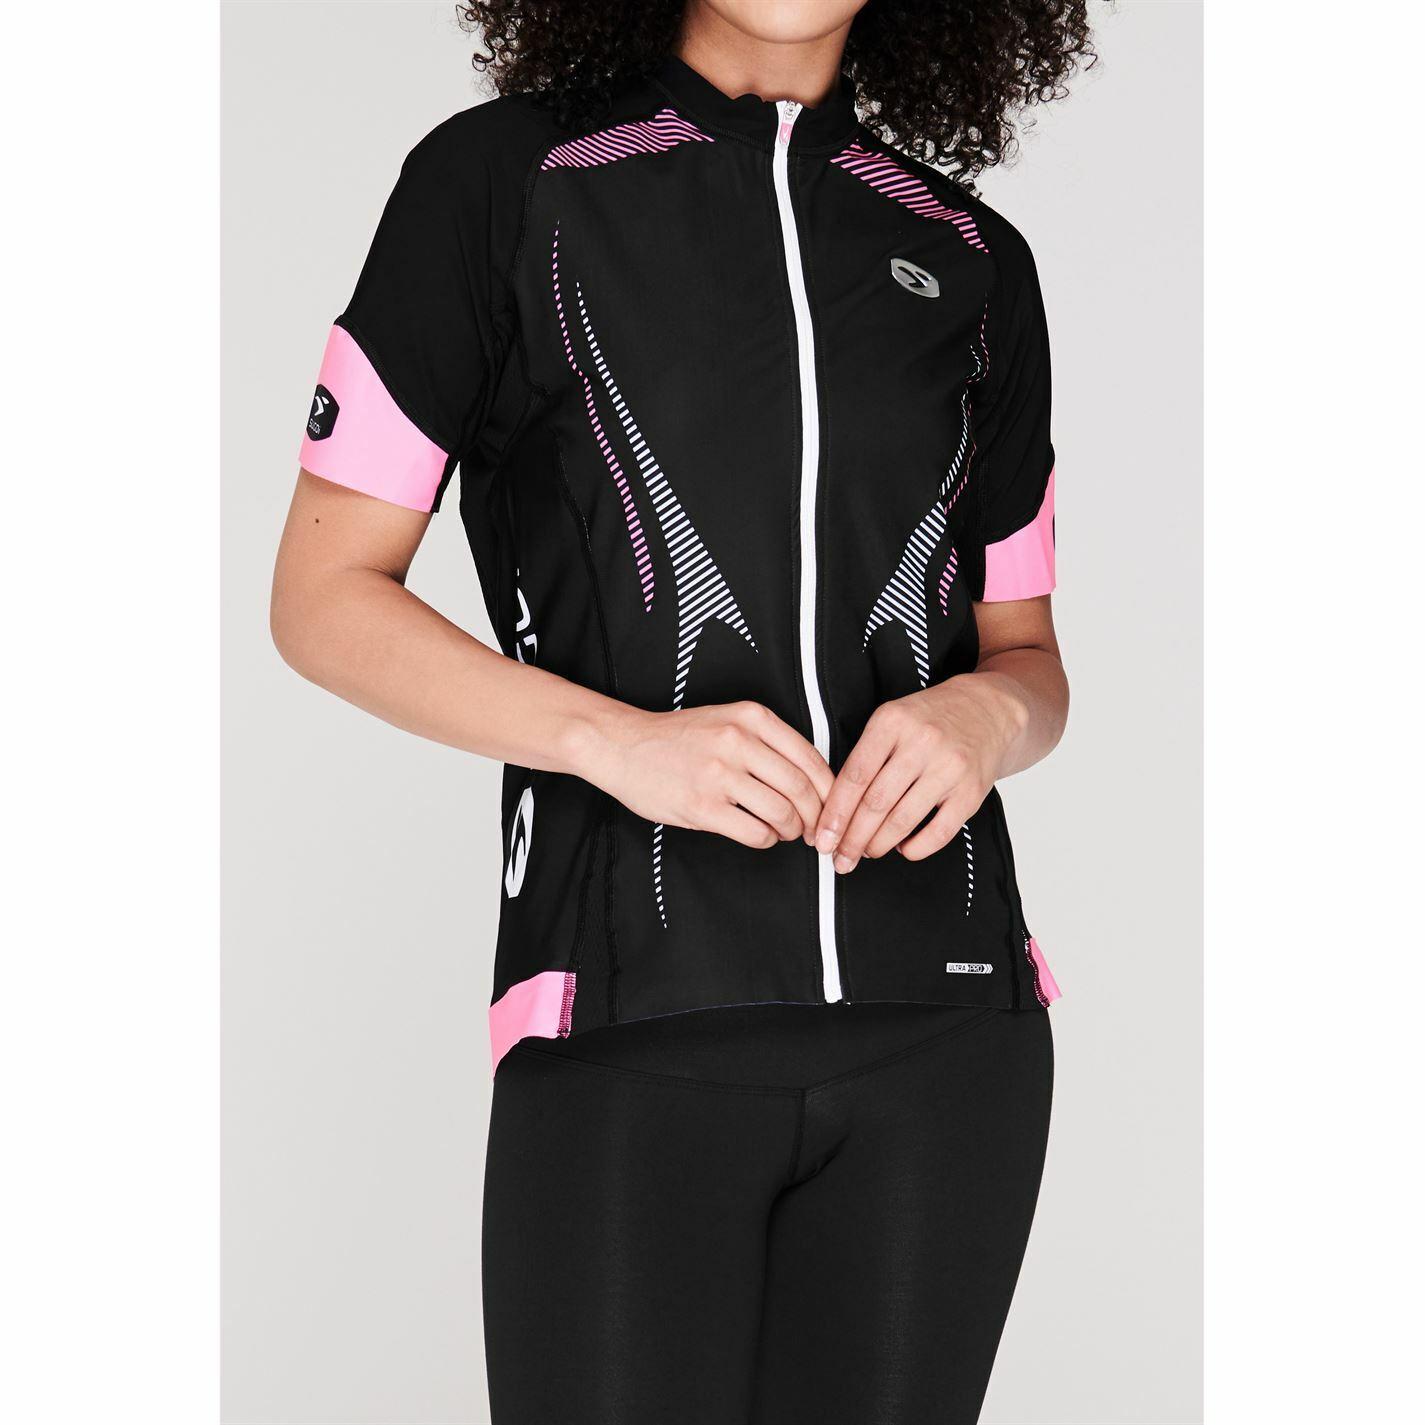 Sugoi DaSie RSE Zip Trikot Funktions T Shirt Kurzarm Fahrradtrikot Radsport